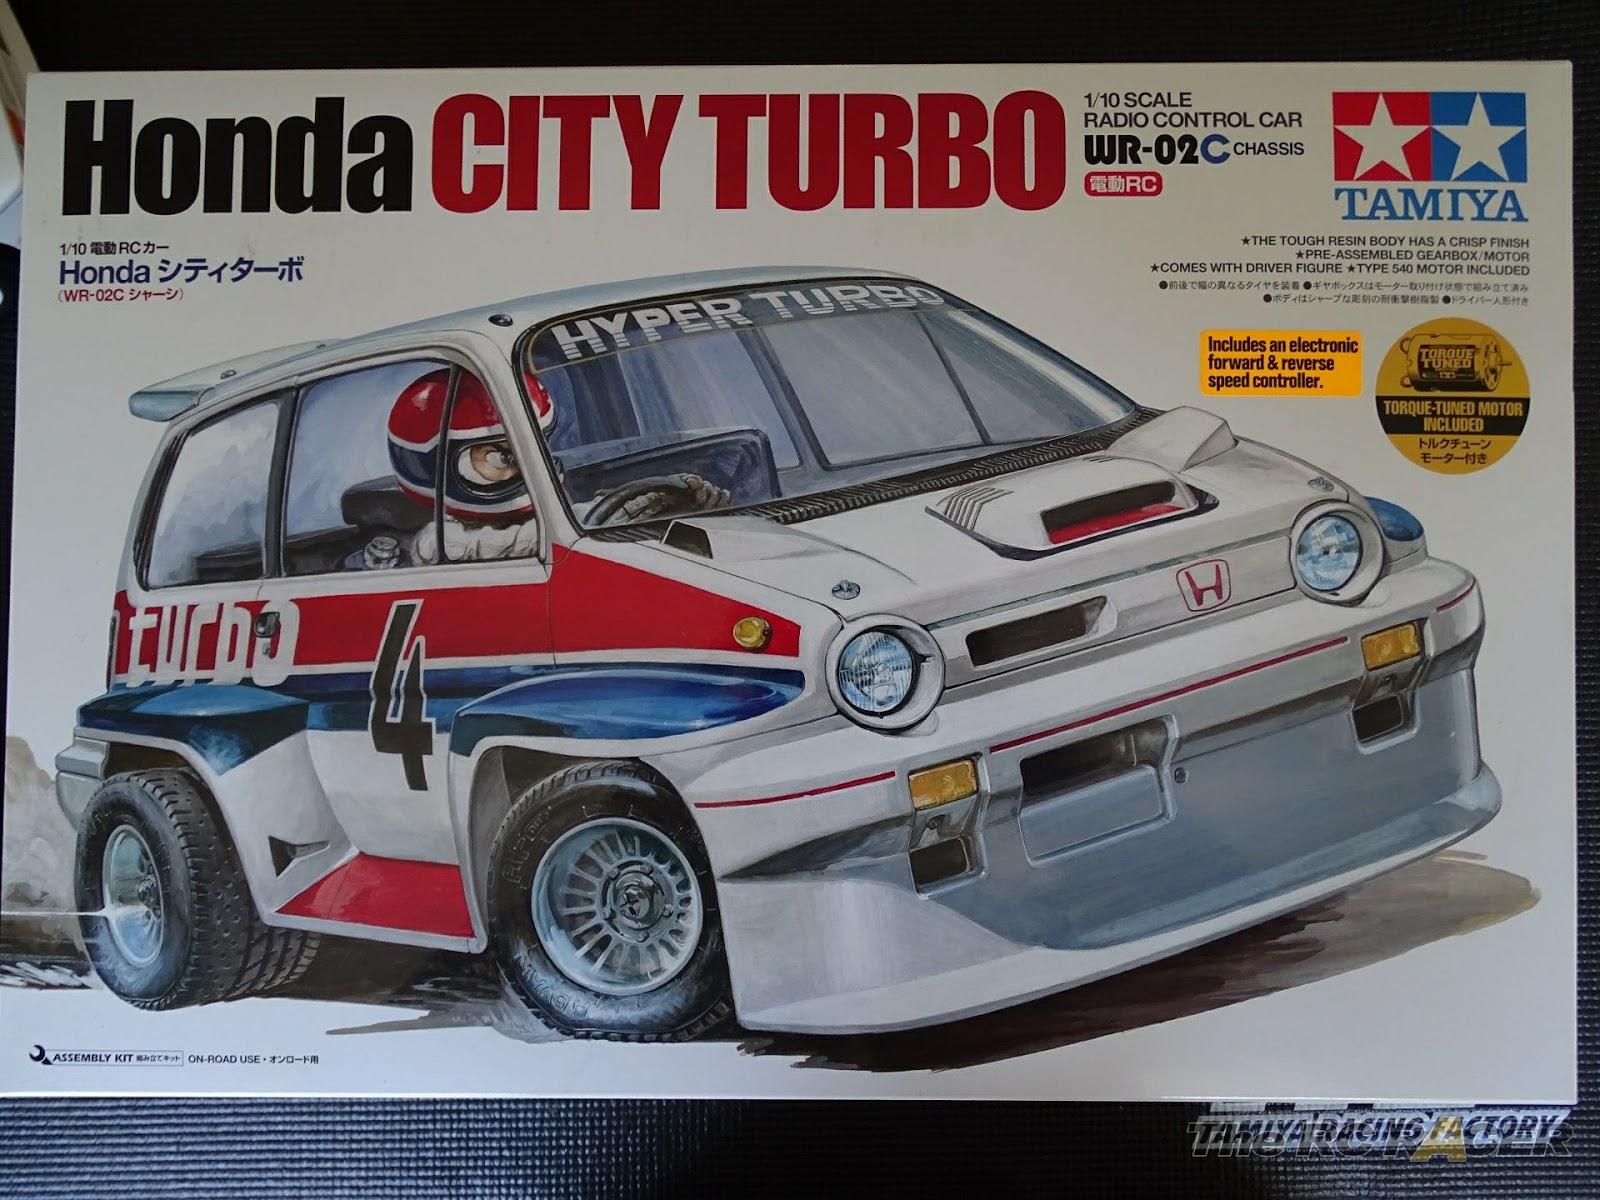 Tamiya 58611 Honda City Turbo Build and review | The RC Racer